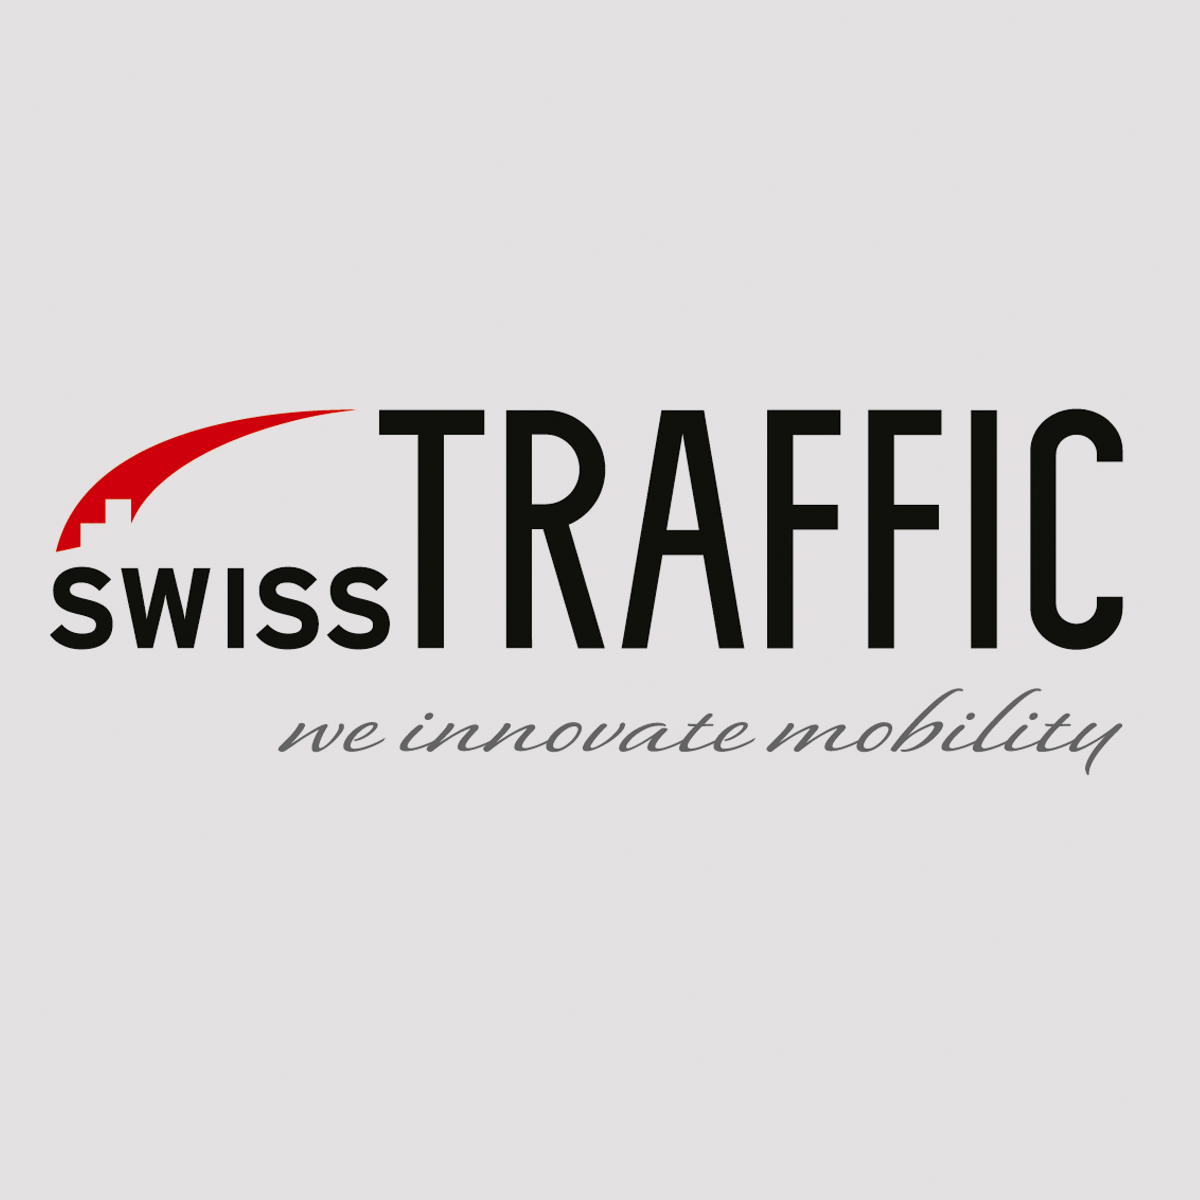 Swisstraffic